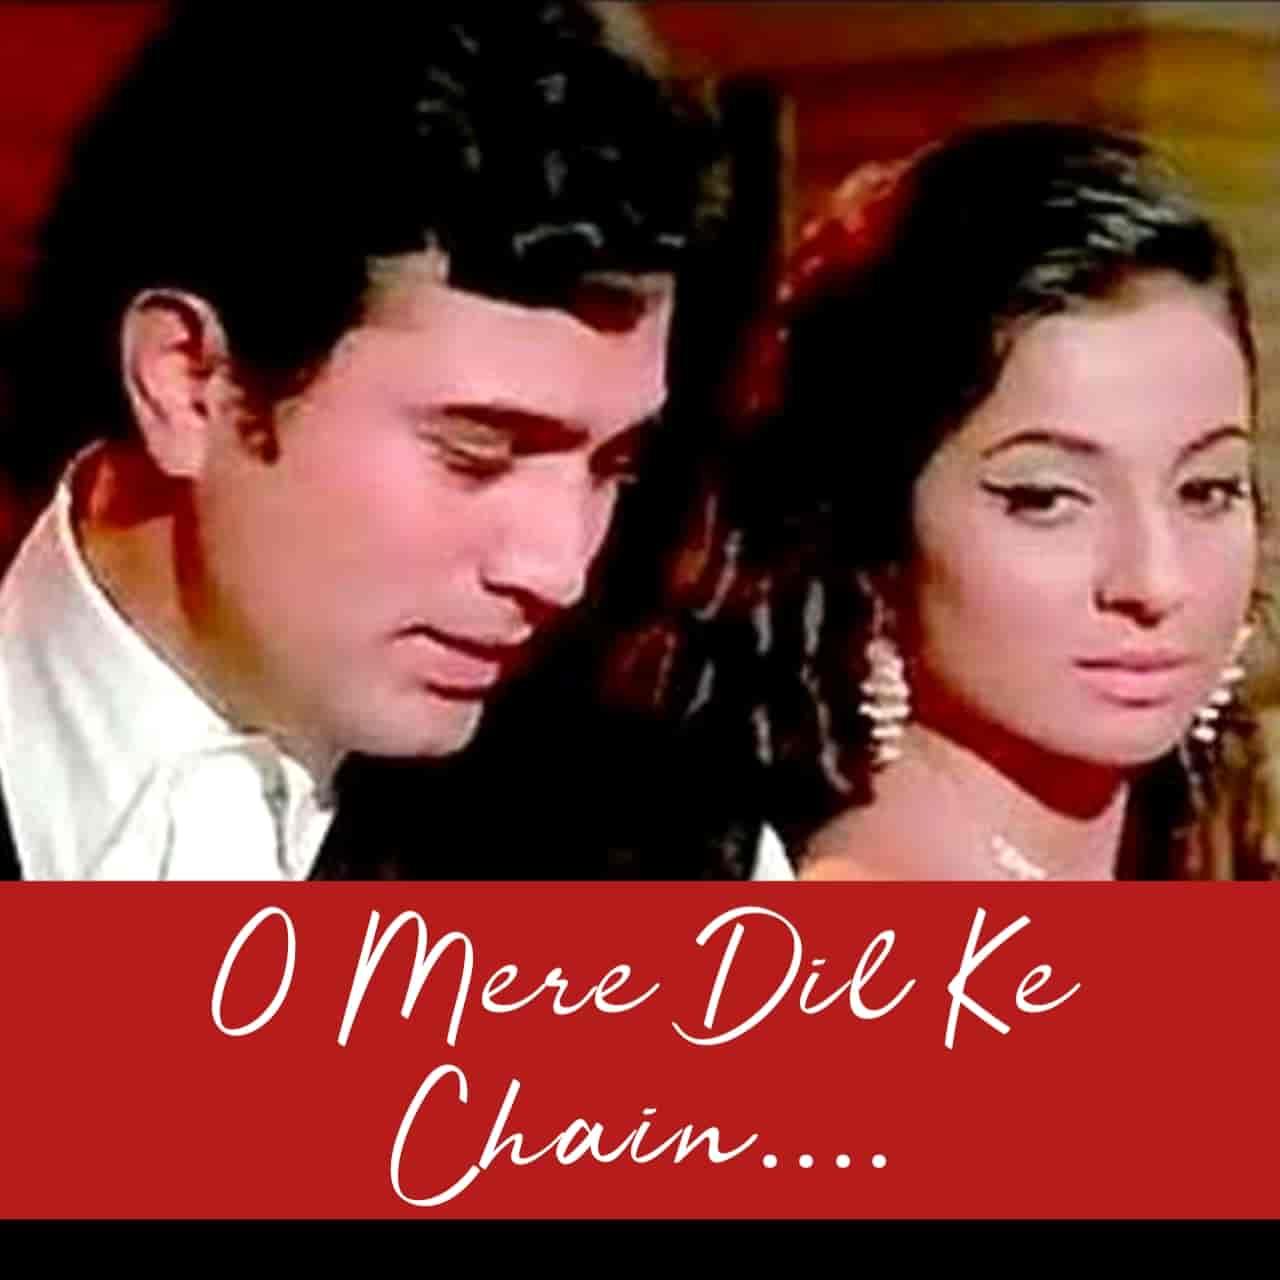 O Mere Dil Ke Chain Hindi Love Song Lyrics, Sung By Kishor Kumar.